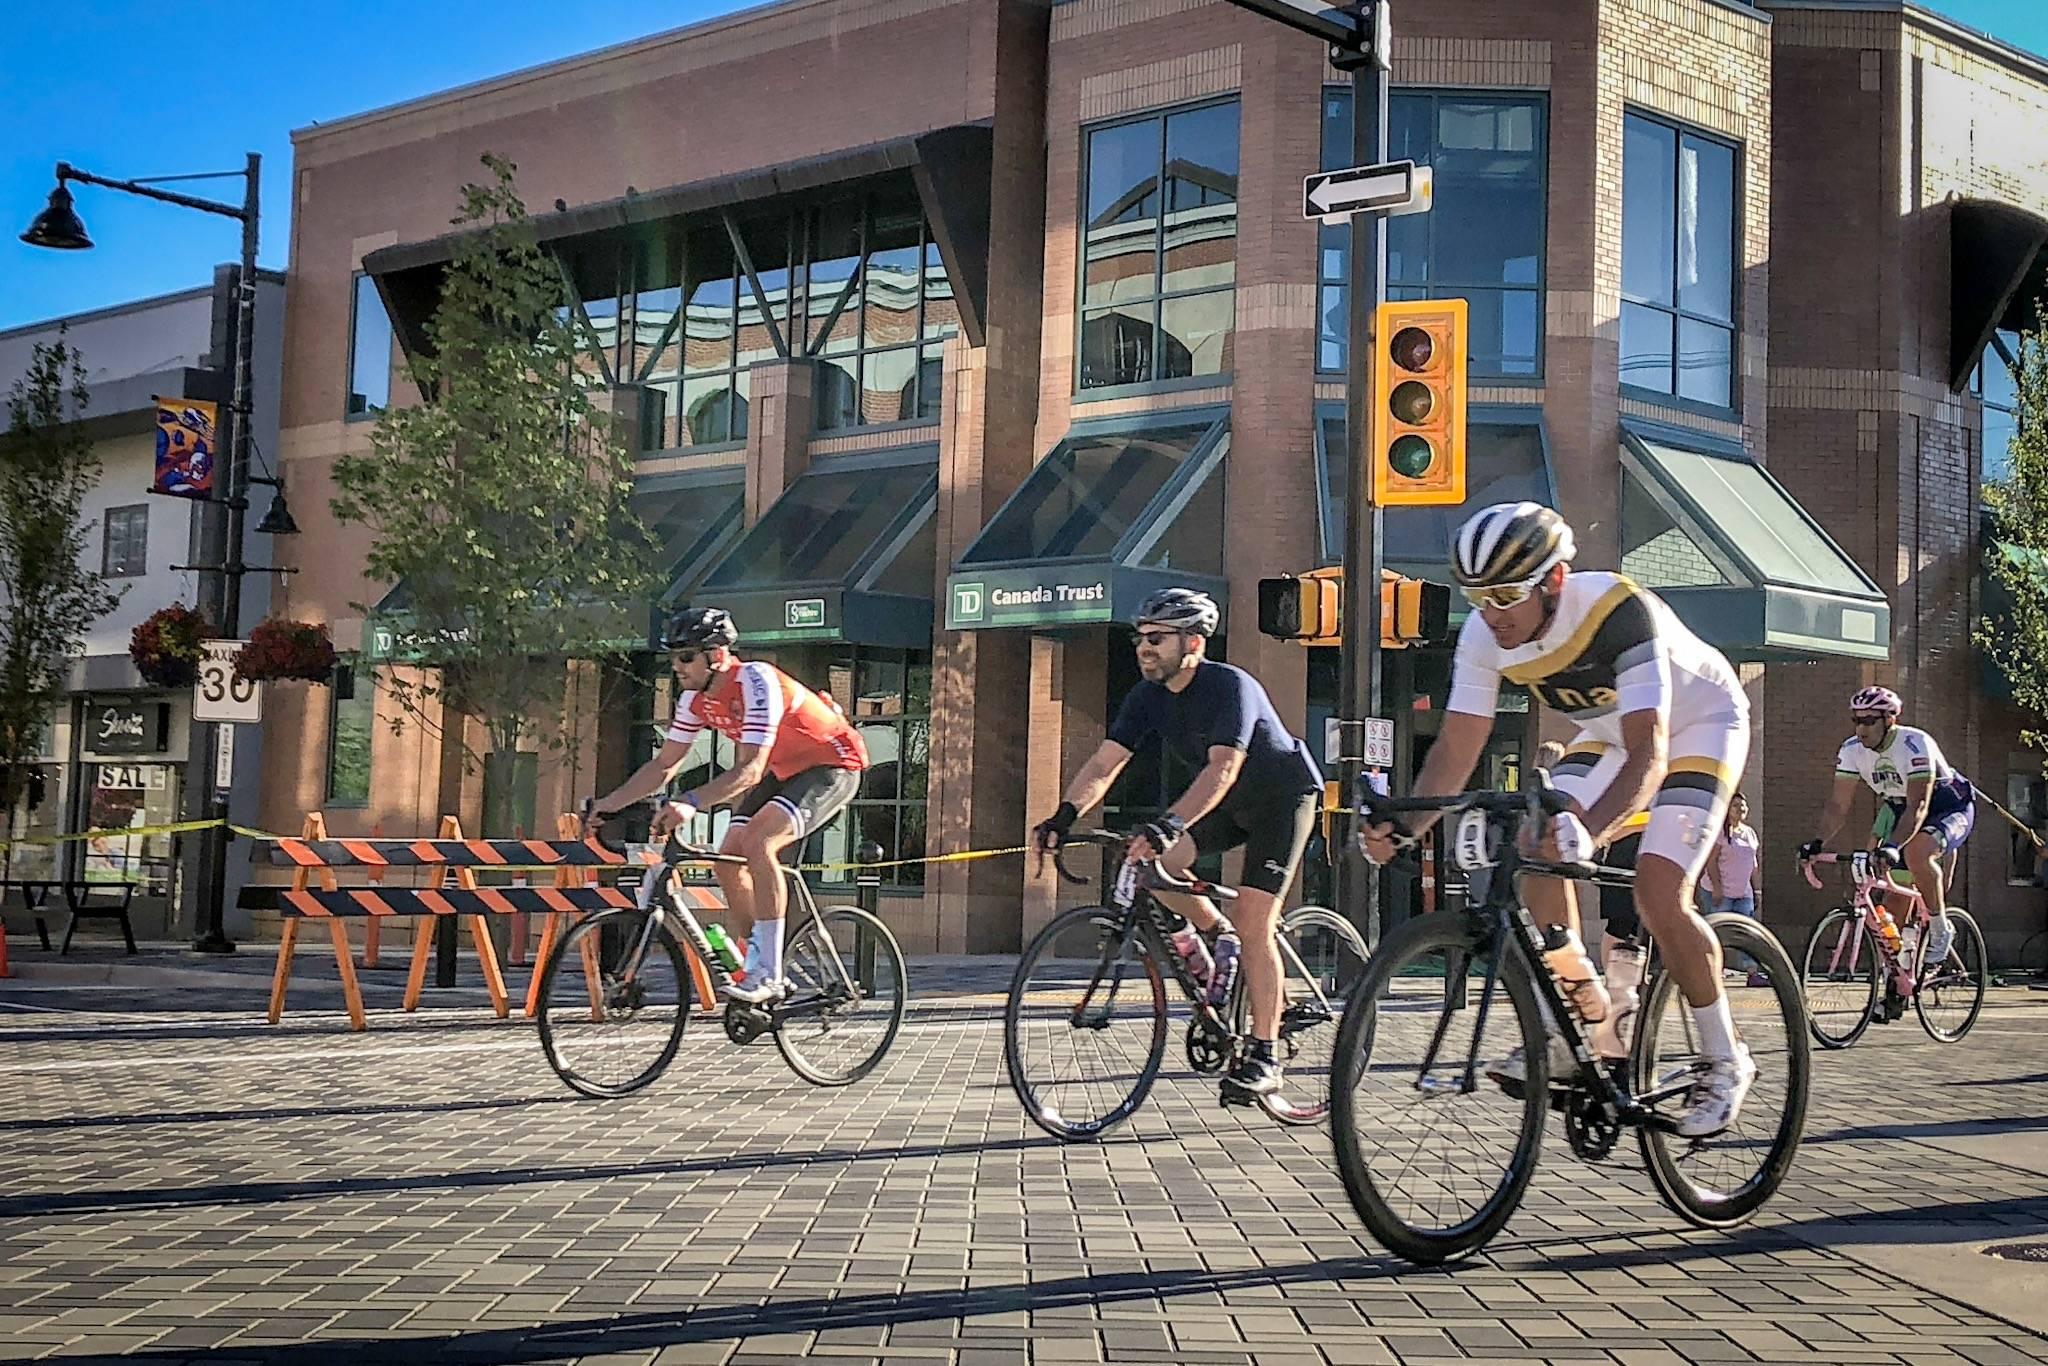 Granfondo rider Lorne Paperny and other participants stream over the cobblestone streets in downton Penticton during the Granfondo Axel Merckx Okanagan cycling event. Do you know where cyclist Axel Merckx was born? (Black Press file photo)